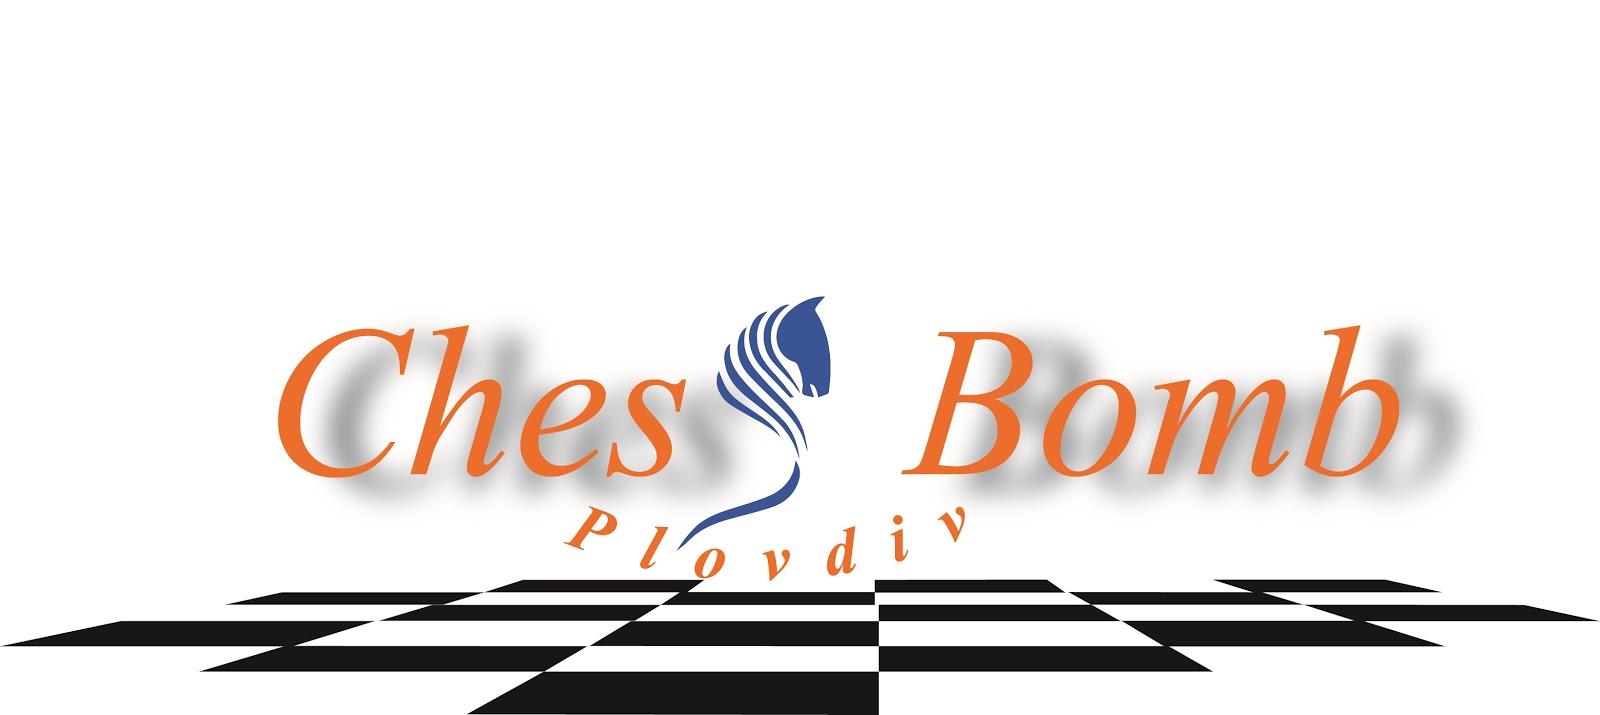 logo Chess bomb pld4(1).jpg